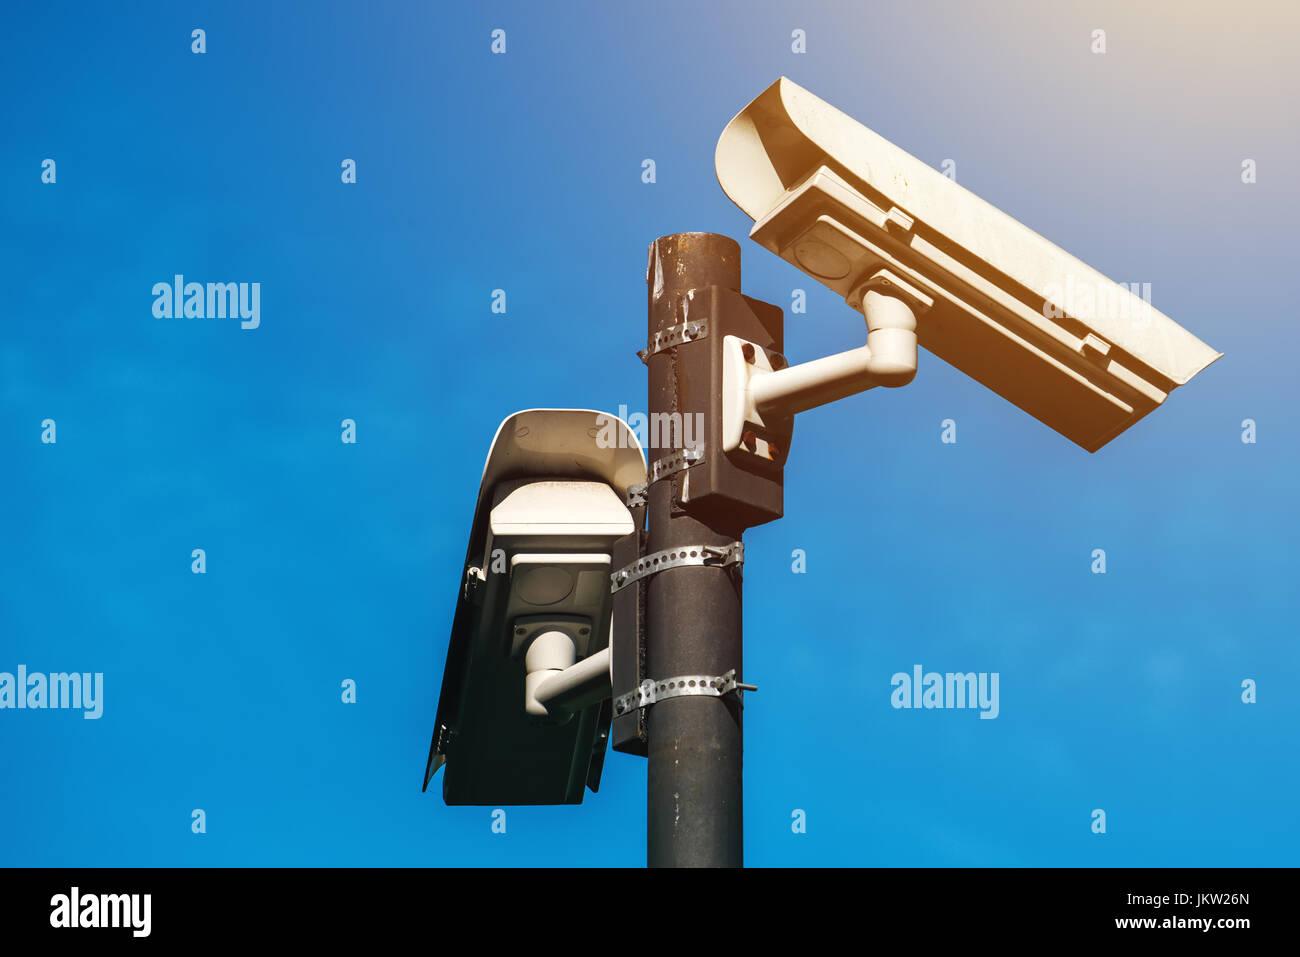 CCTV camera, modern era anti-terrorist electronic surveillance security cameras against blue sky that symbolizes - Stock Image